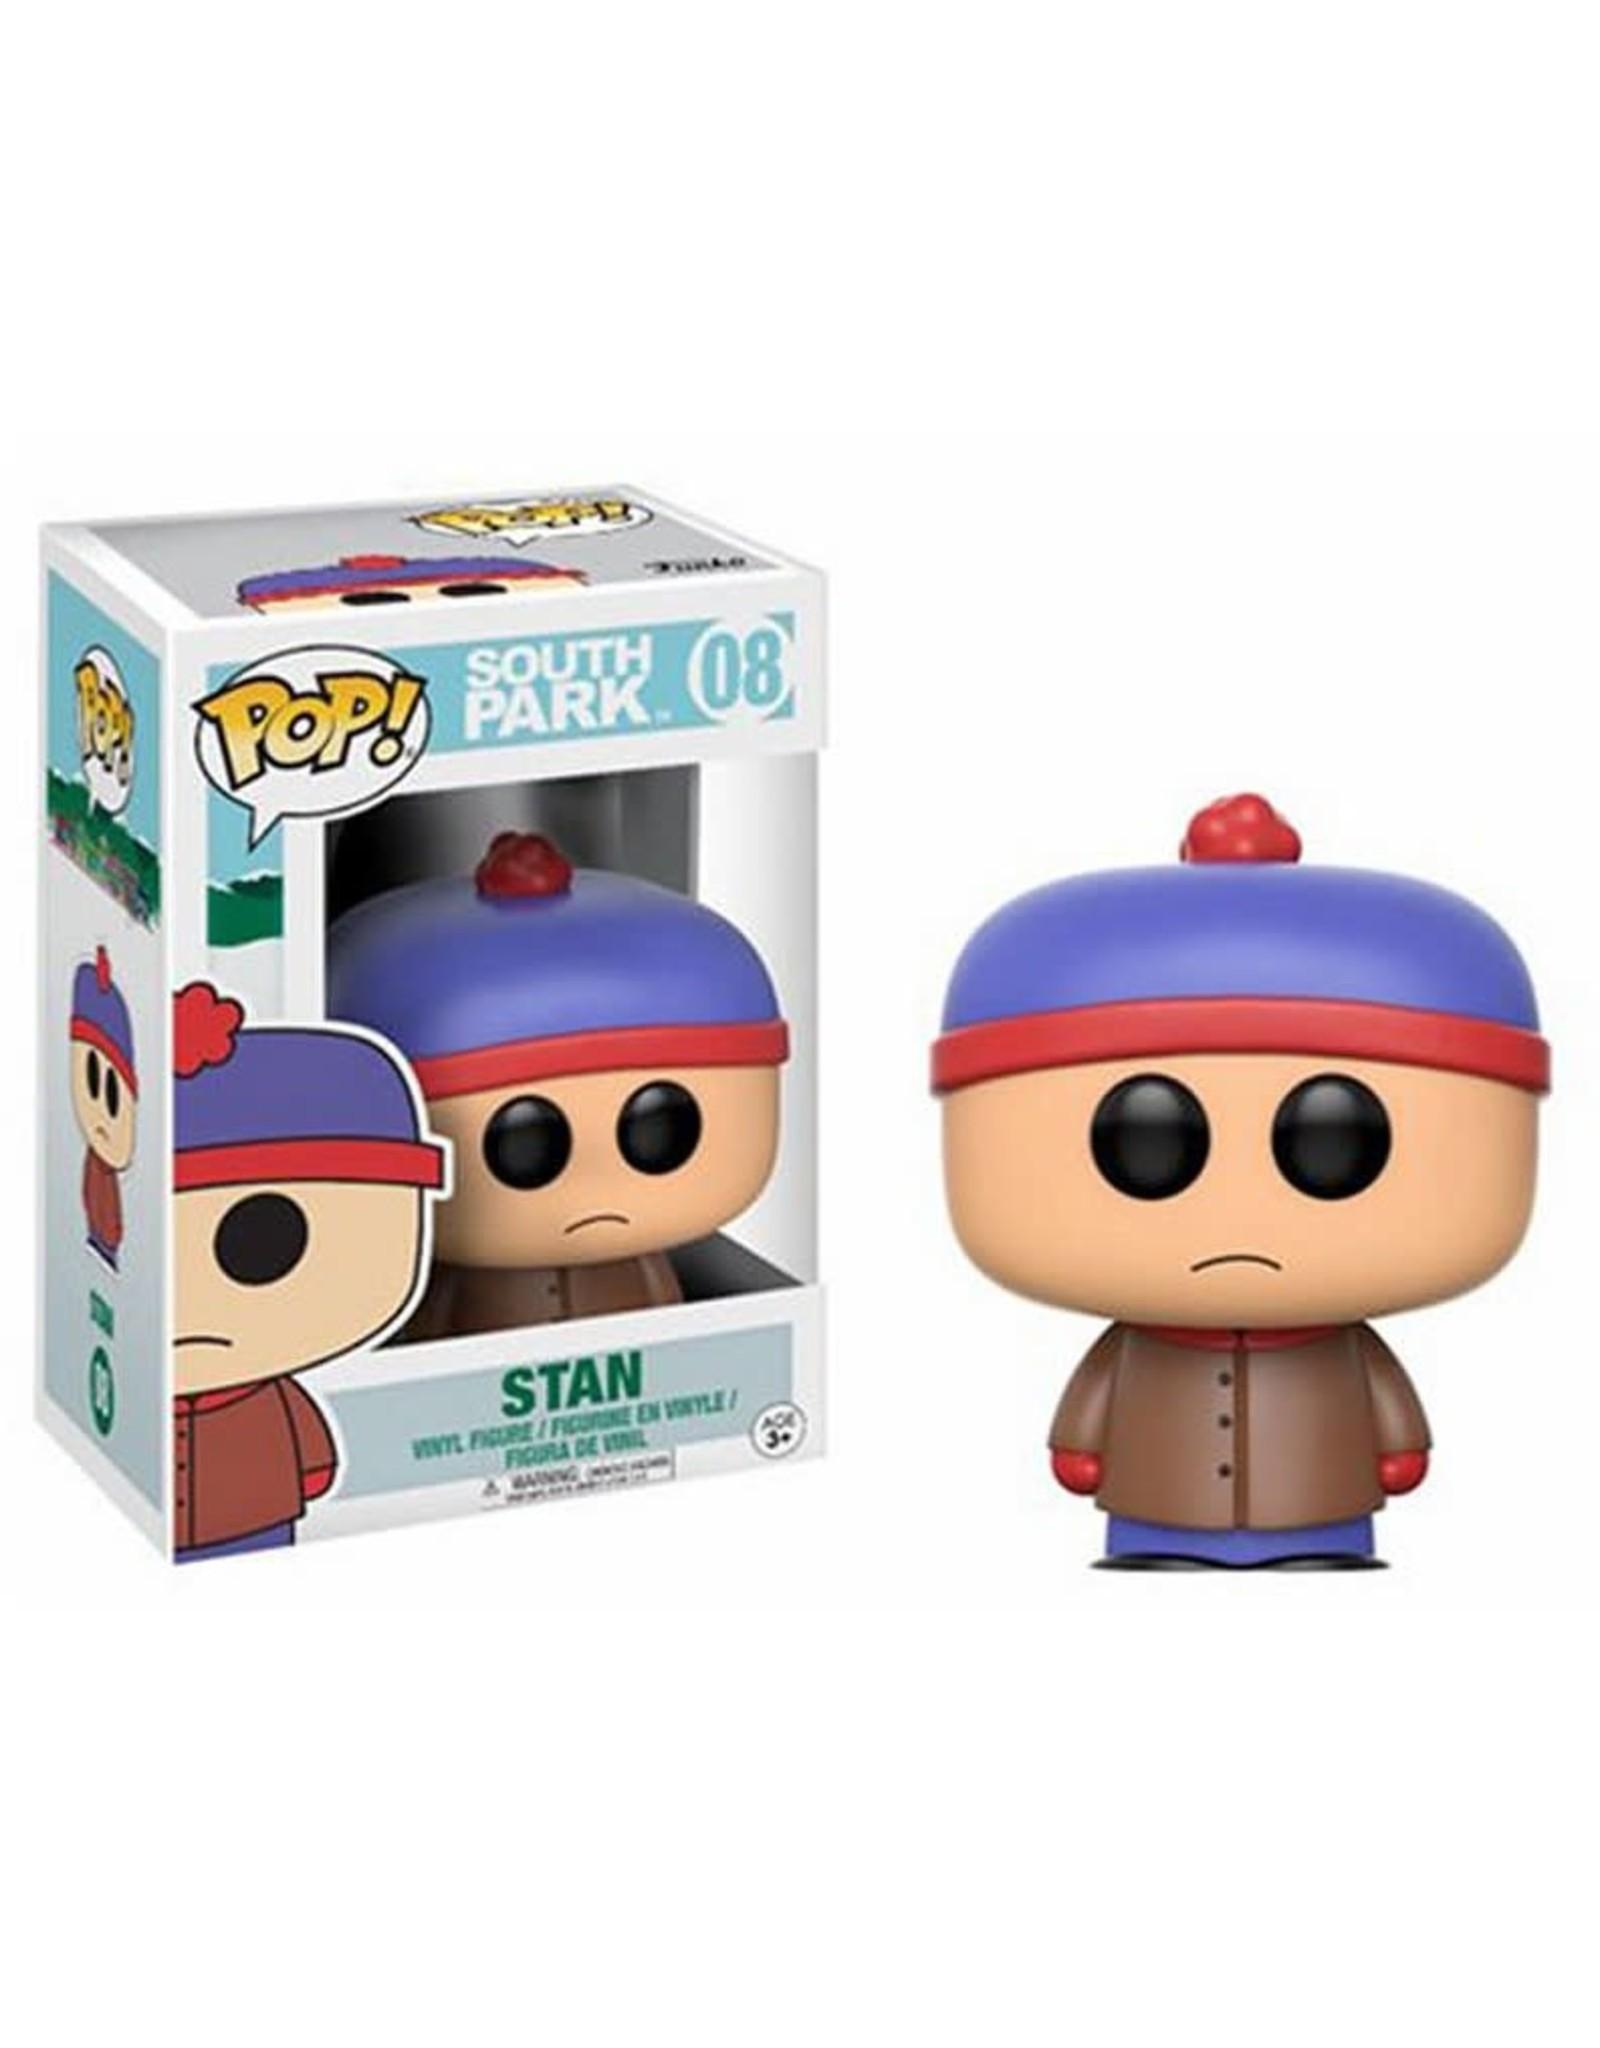 Funko Pop! Funko Pop! South Park nr008 Stan